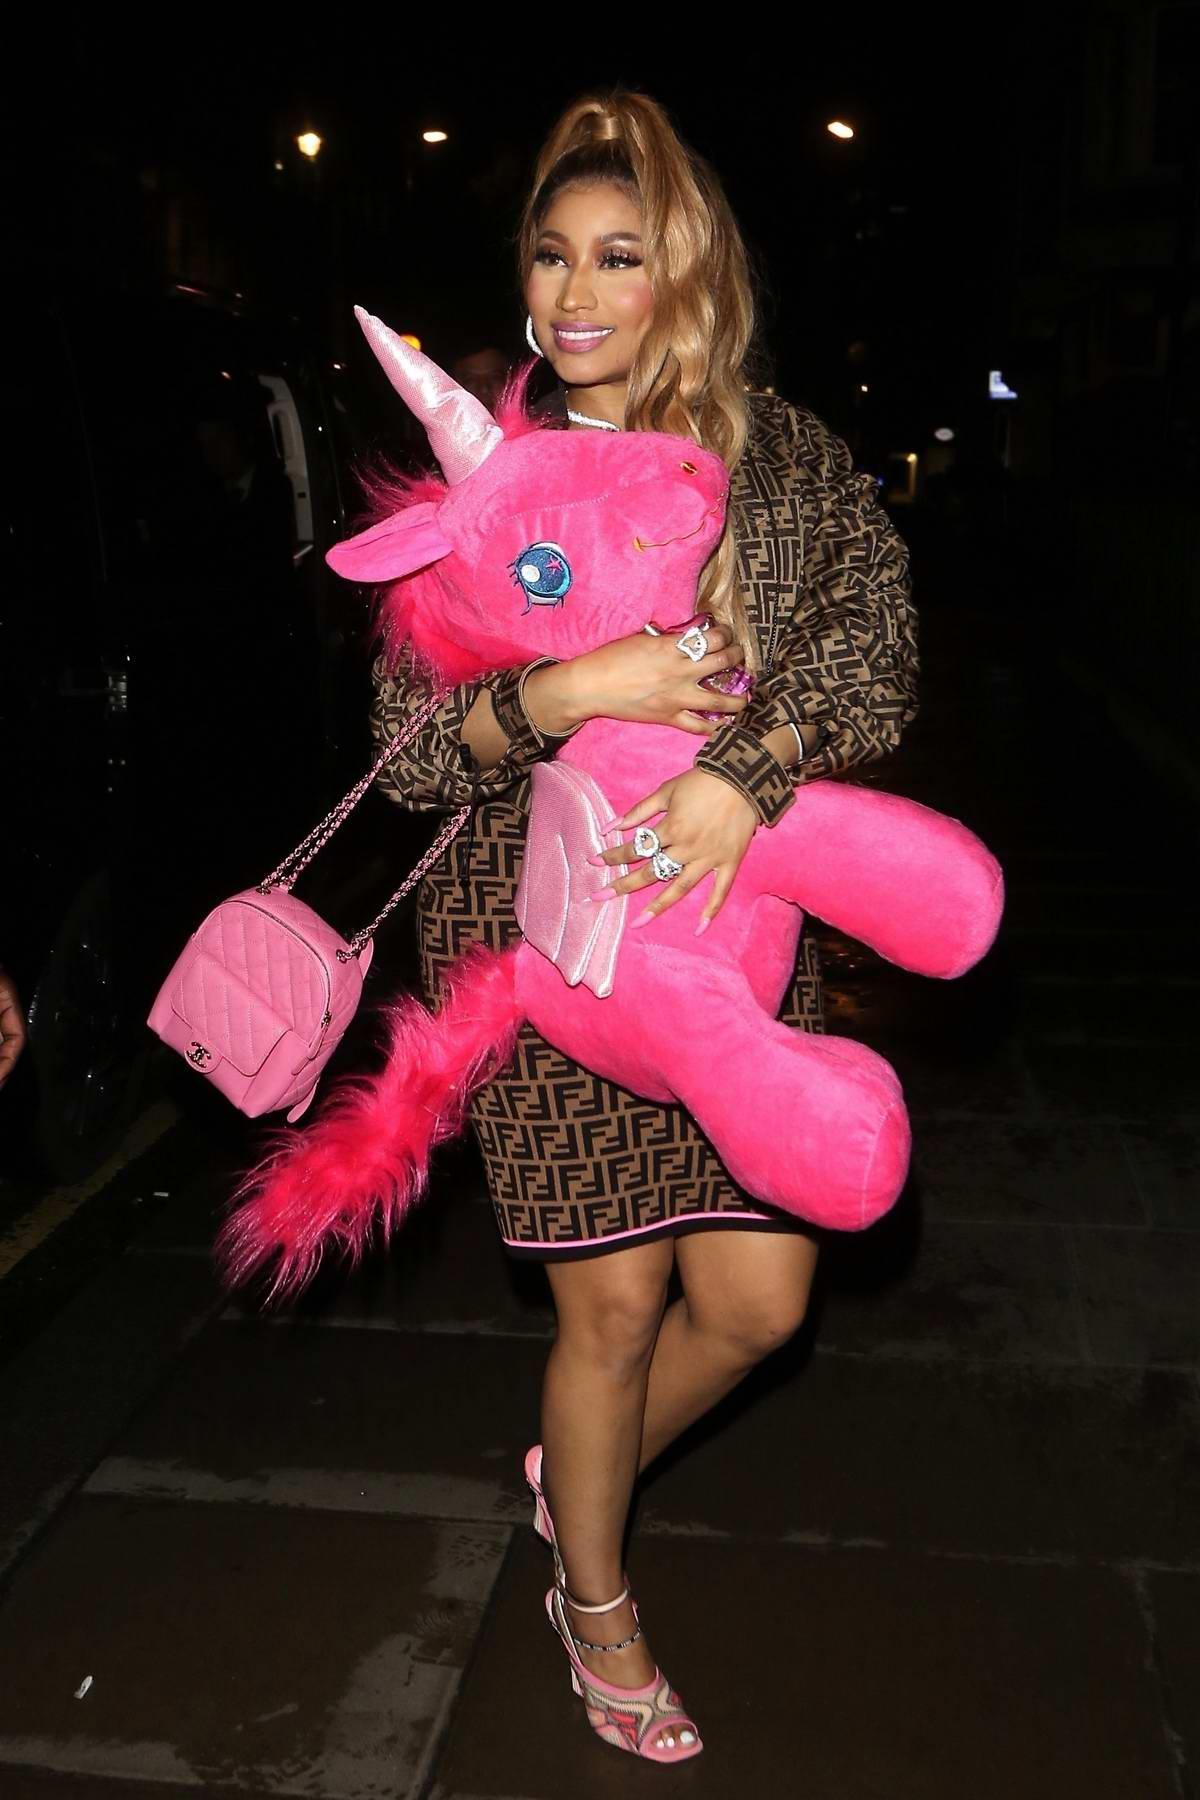 Nicki Minaj rocks a Fendi dress and a pink unicorn as she leaves Opium nightclub in London, UK